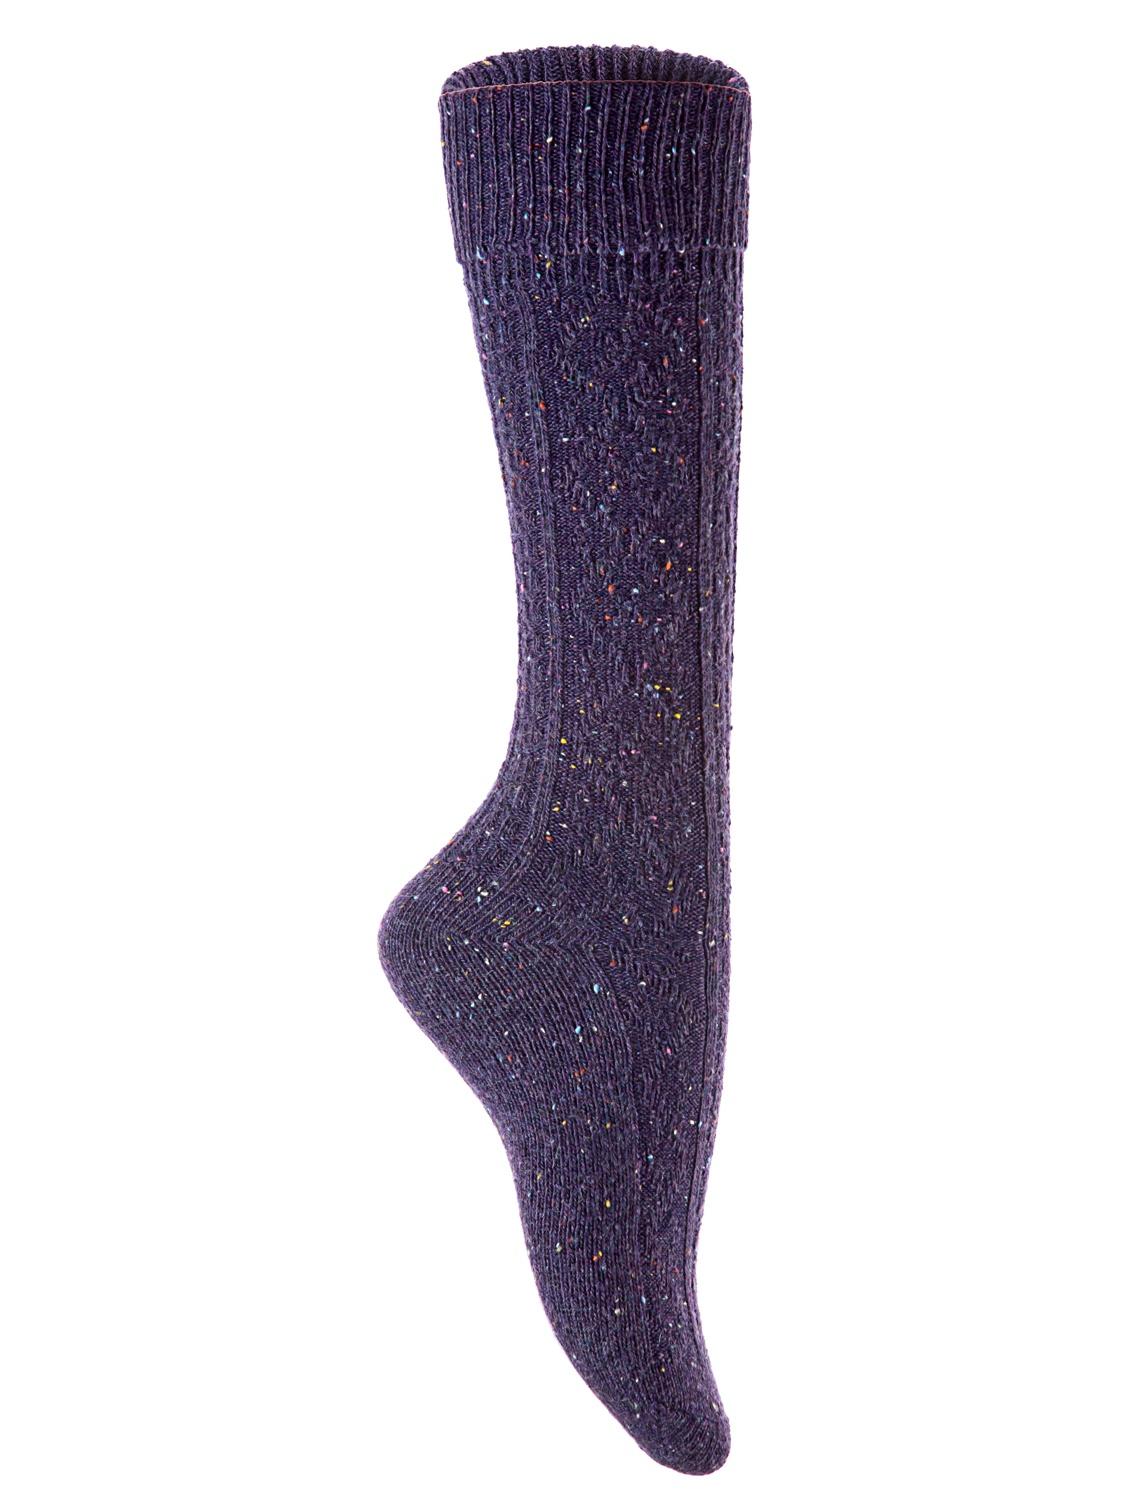 Lian Style Big Girl's 2 Pairs Wool Knee-high Crew Socks Size L (Purple)